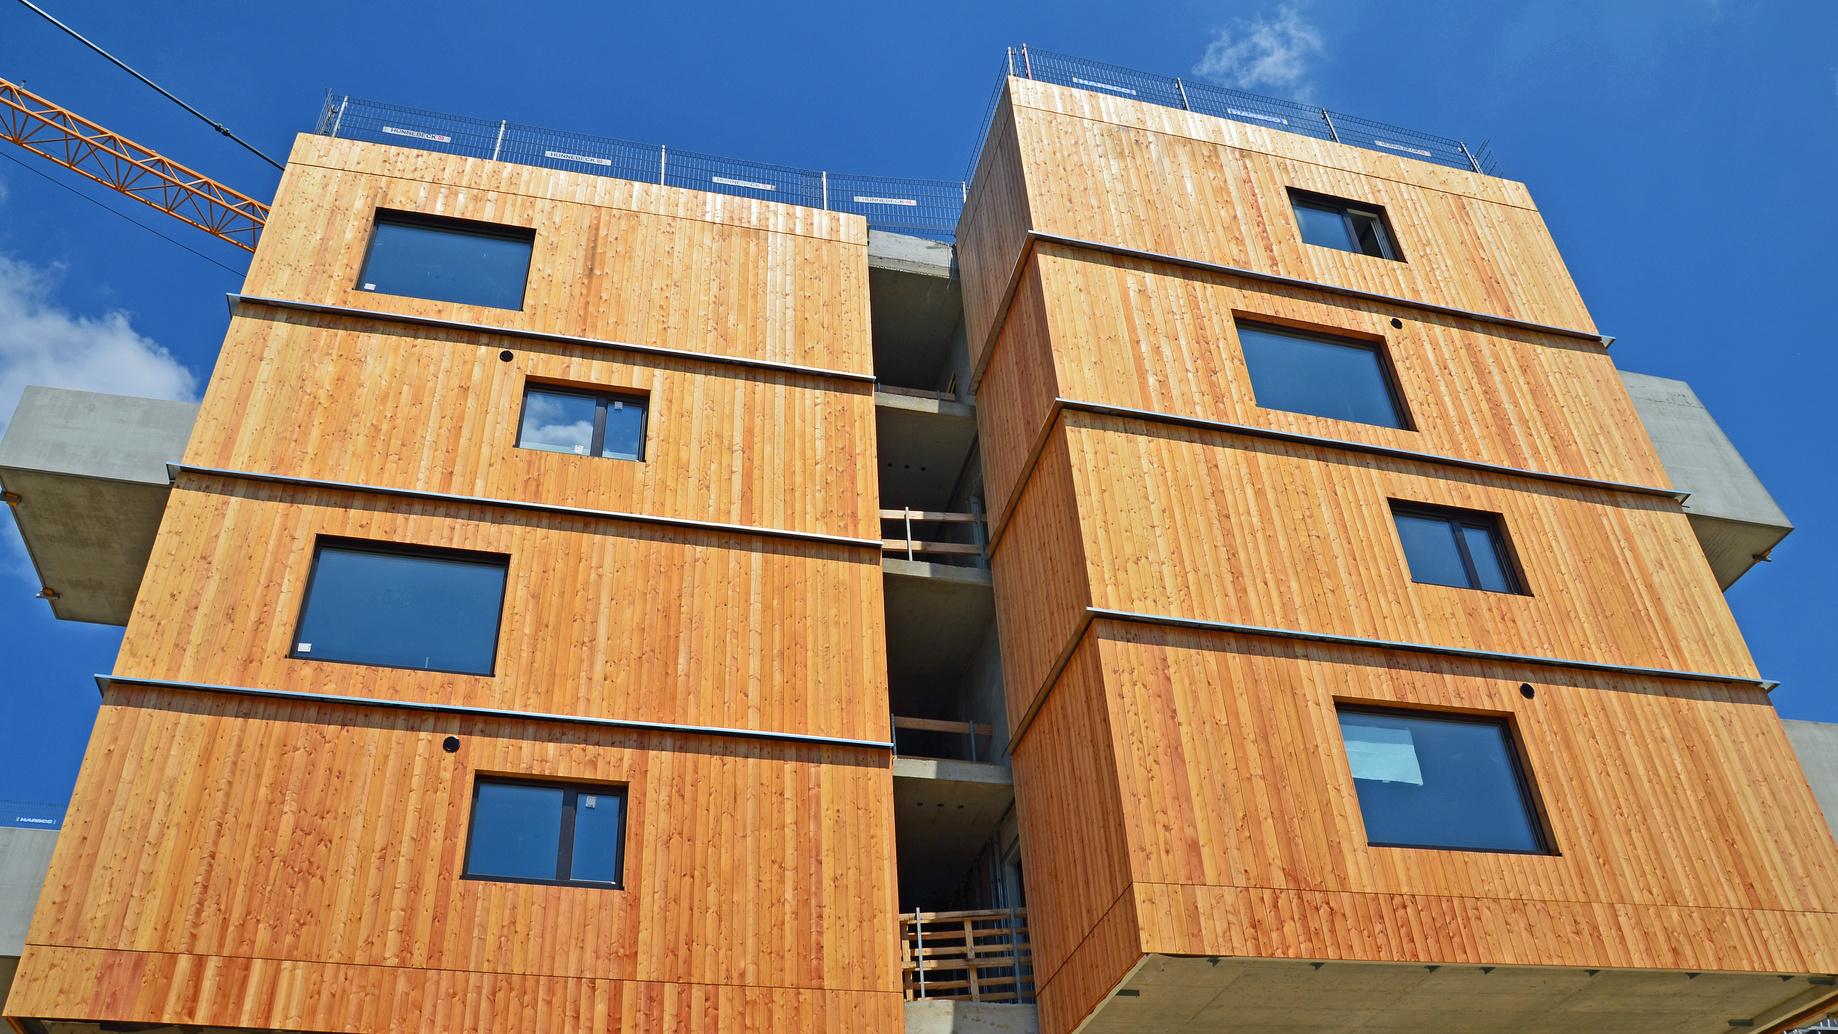 Façade en bois d'un immeuble